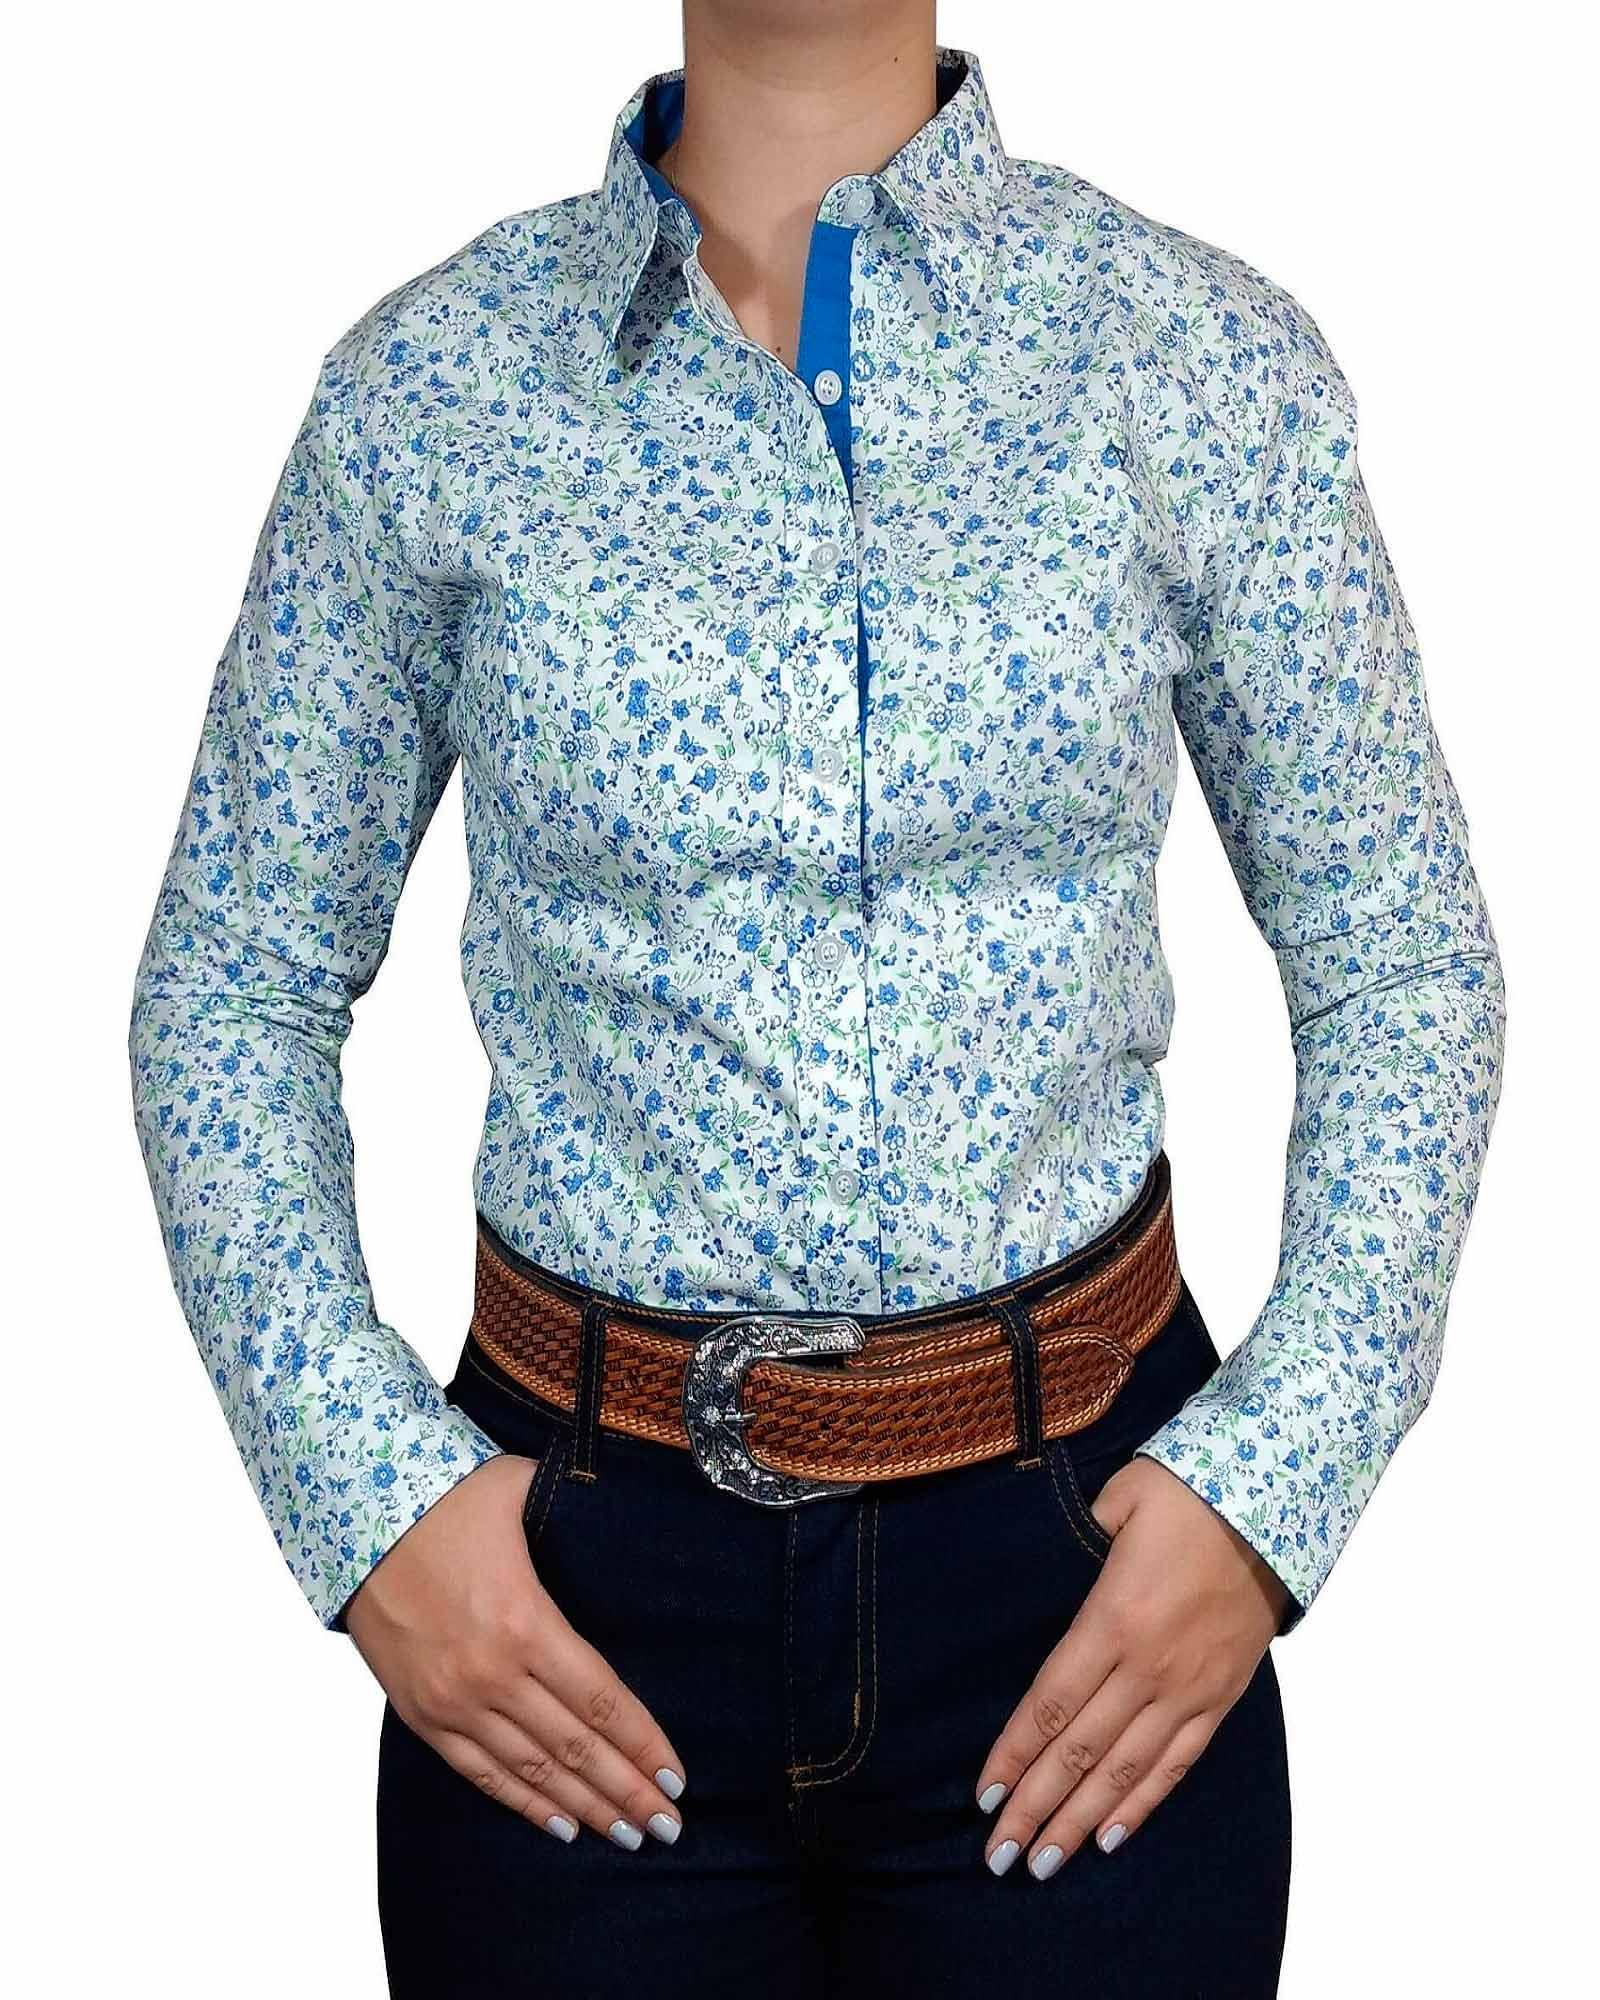 Camisa Feminina Black Angus Azul e Branco Floral